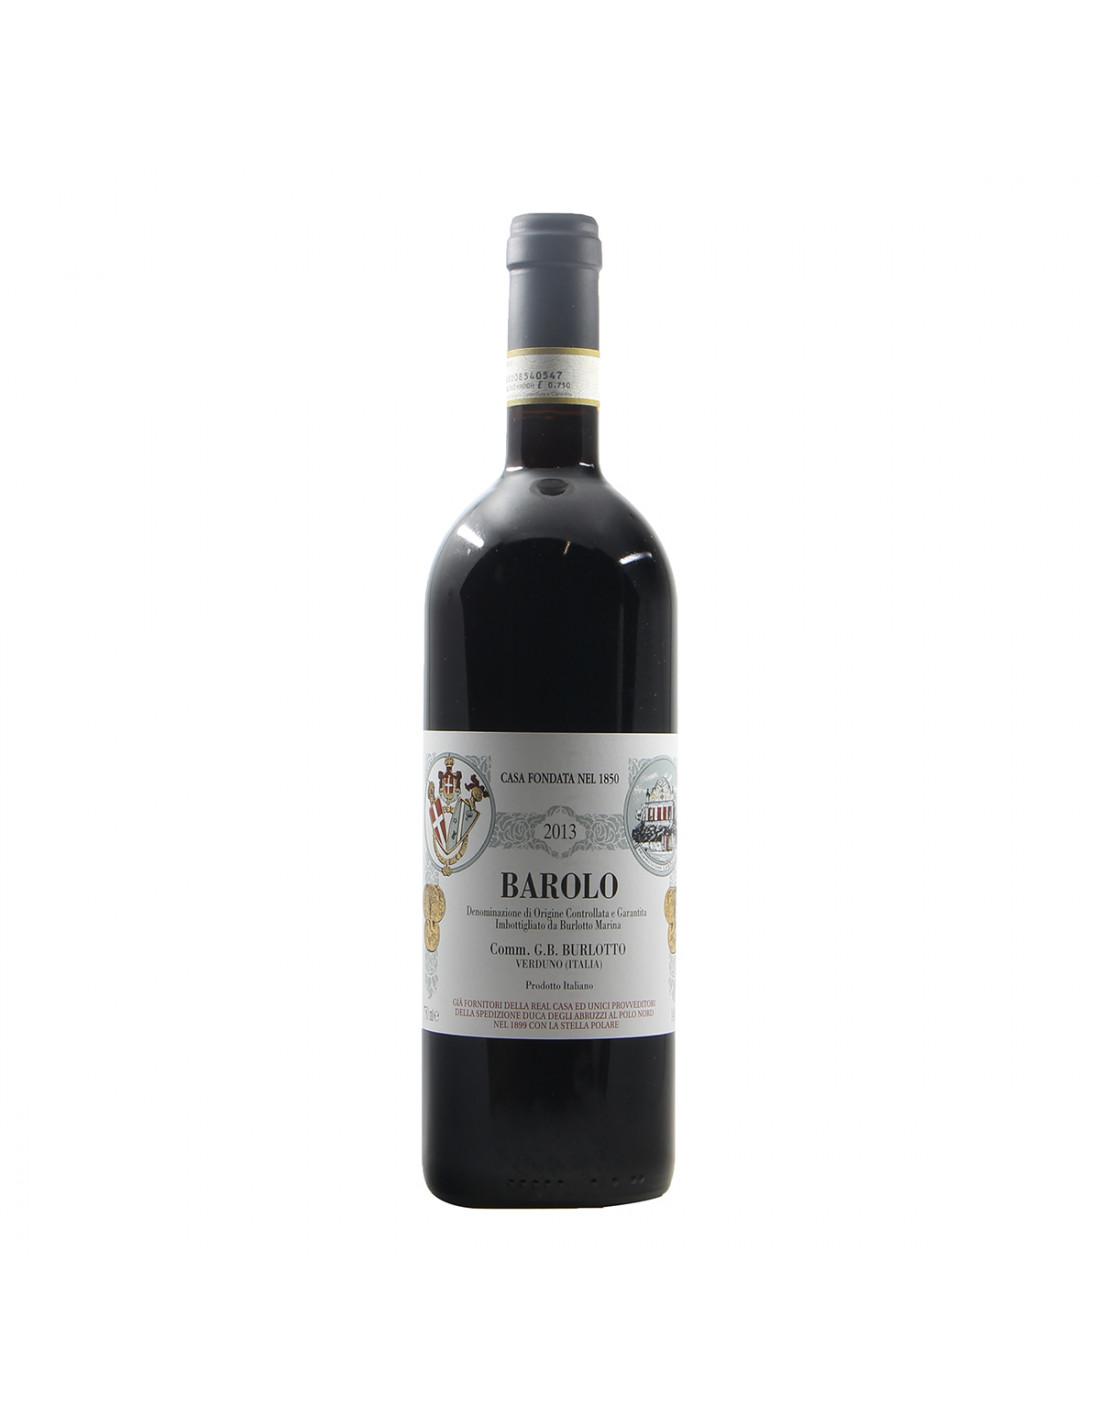 Burlotto Barolo 2013 Grandi Bottiglie